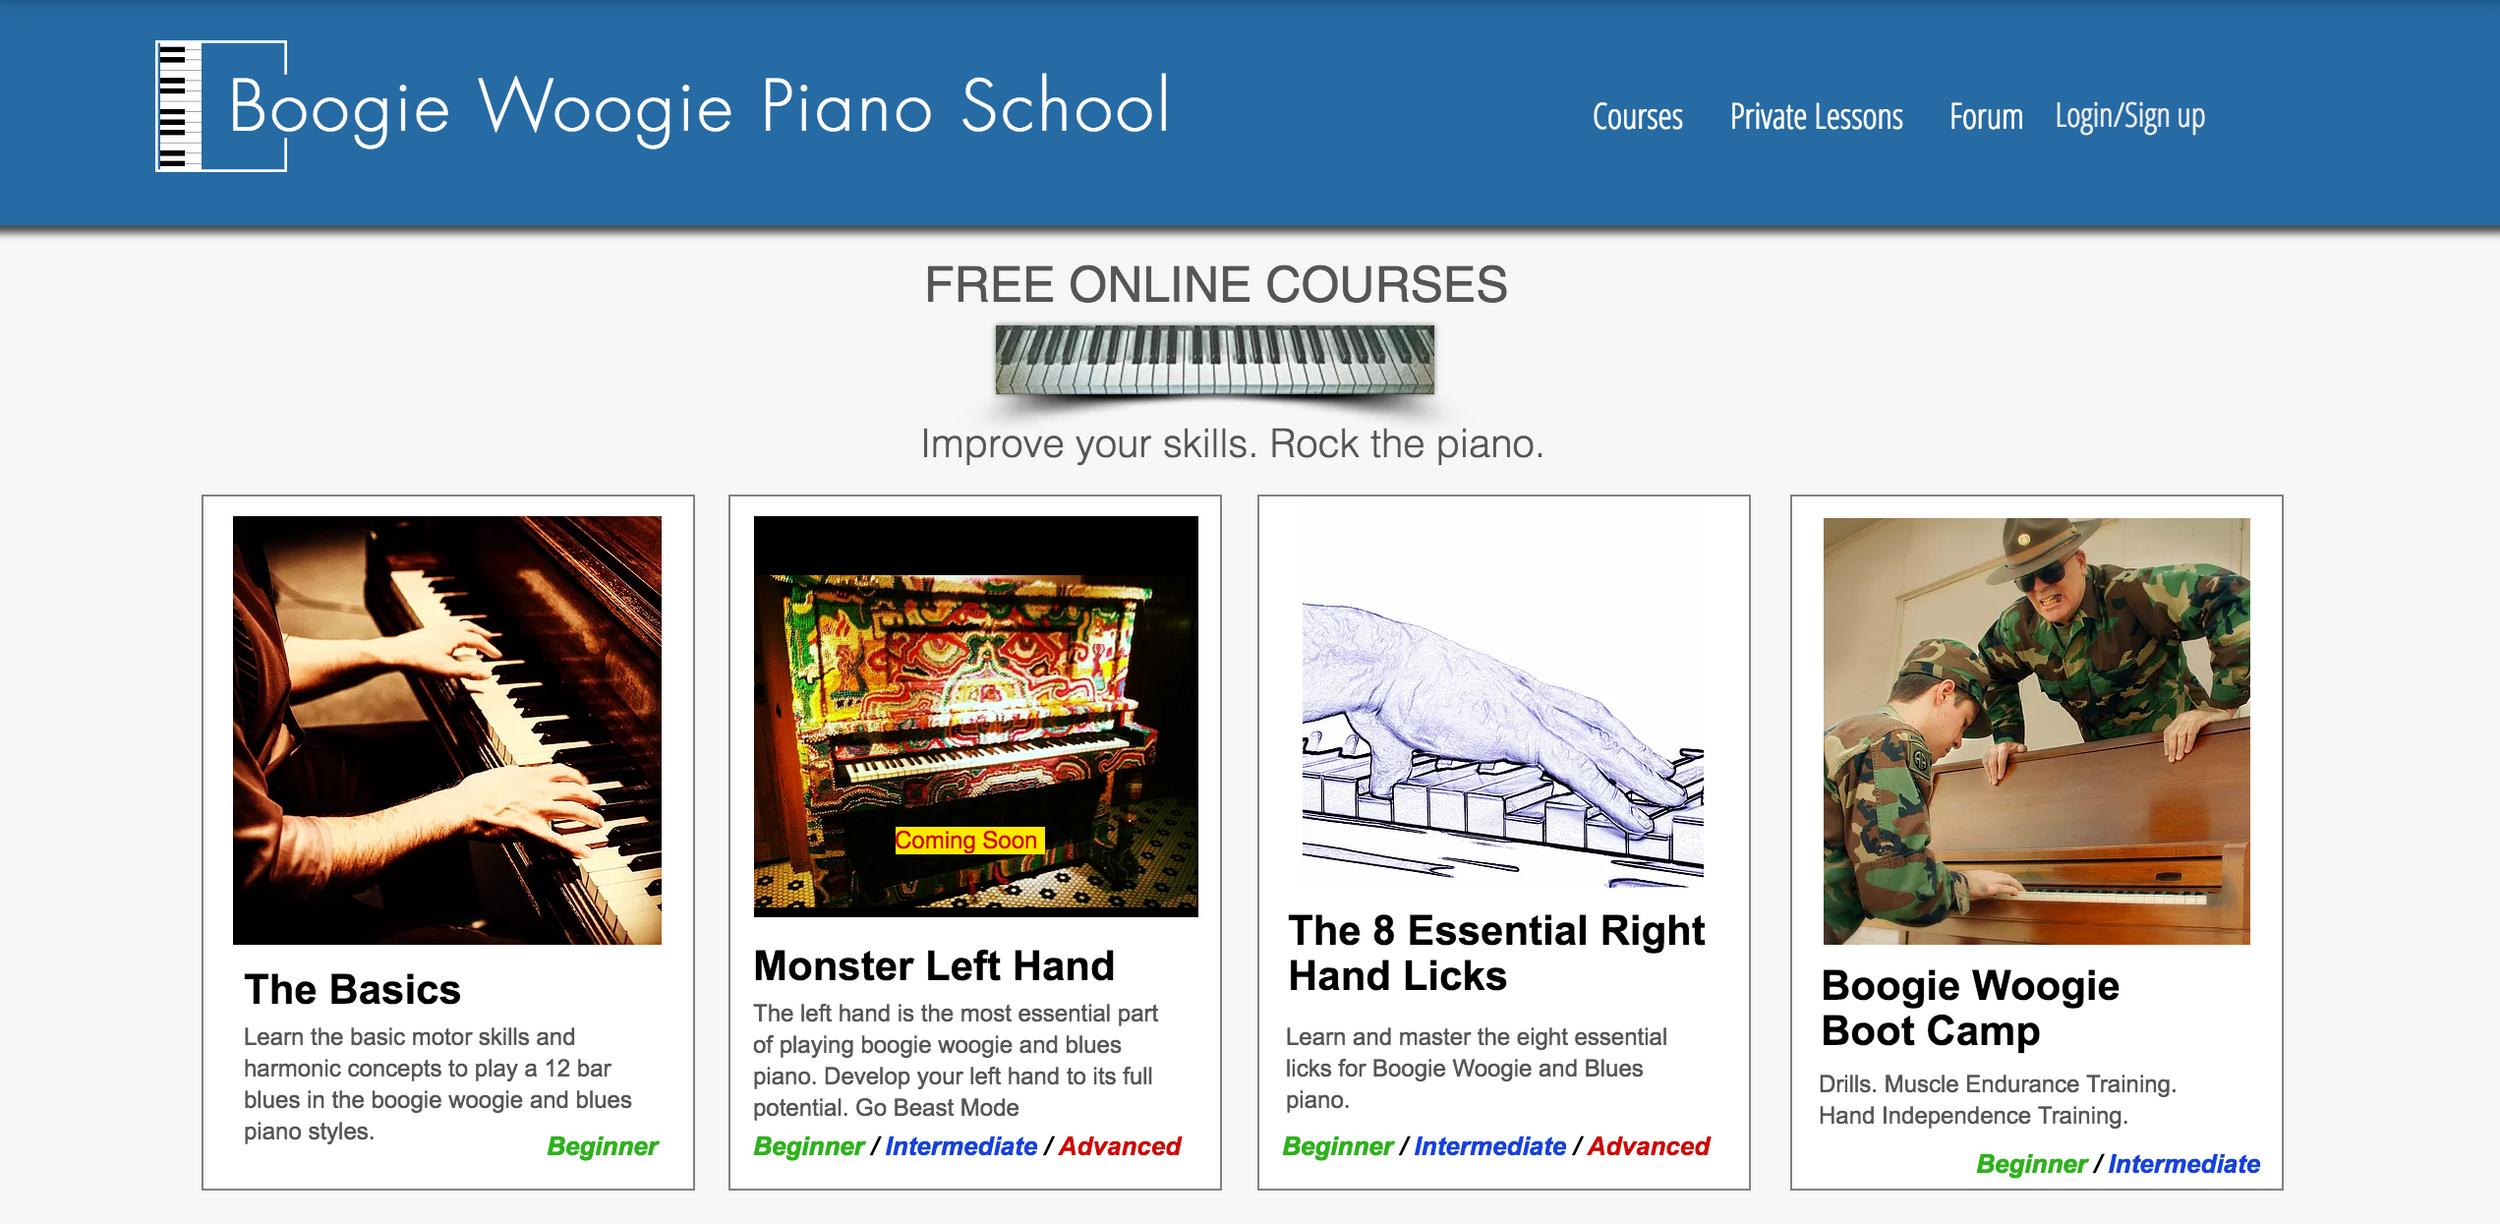 Boogie Woogie Piano School | All Courses